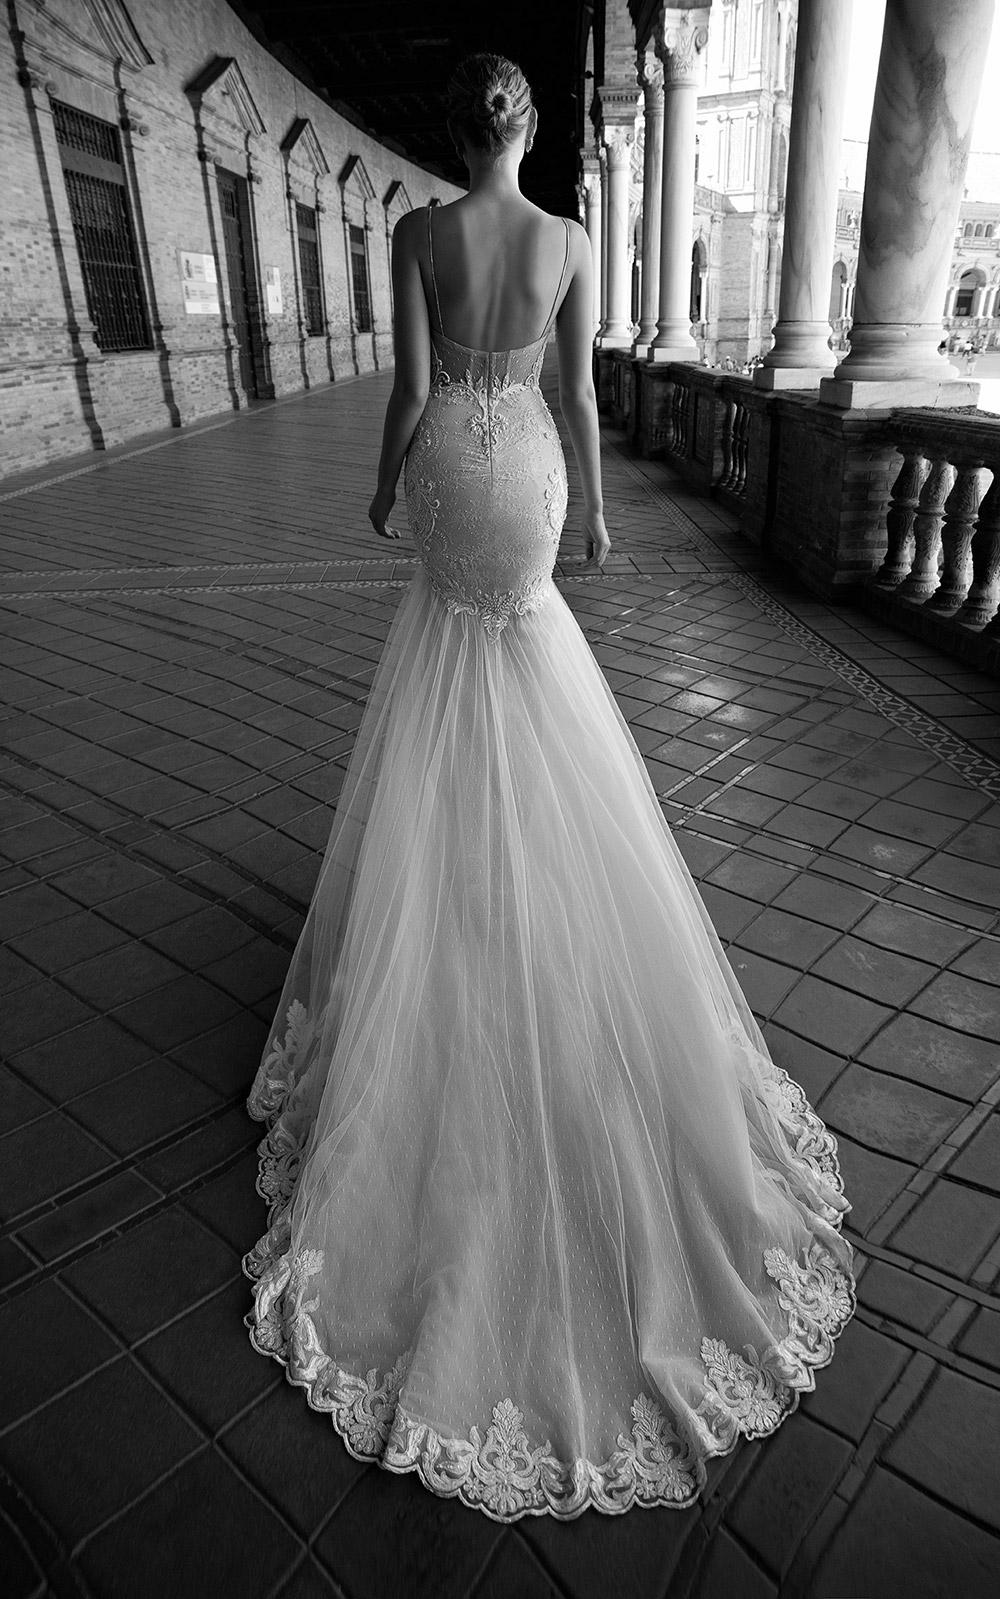 GISELE - Alon Livne 2017 Bridal Collection. www.theweddingnotebook.com